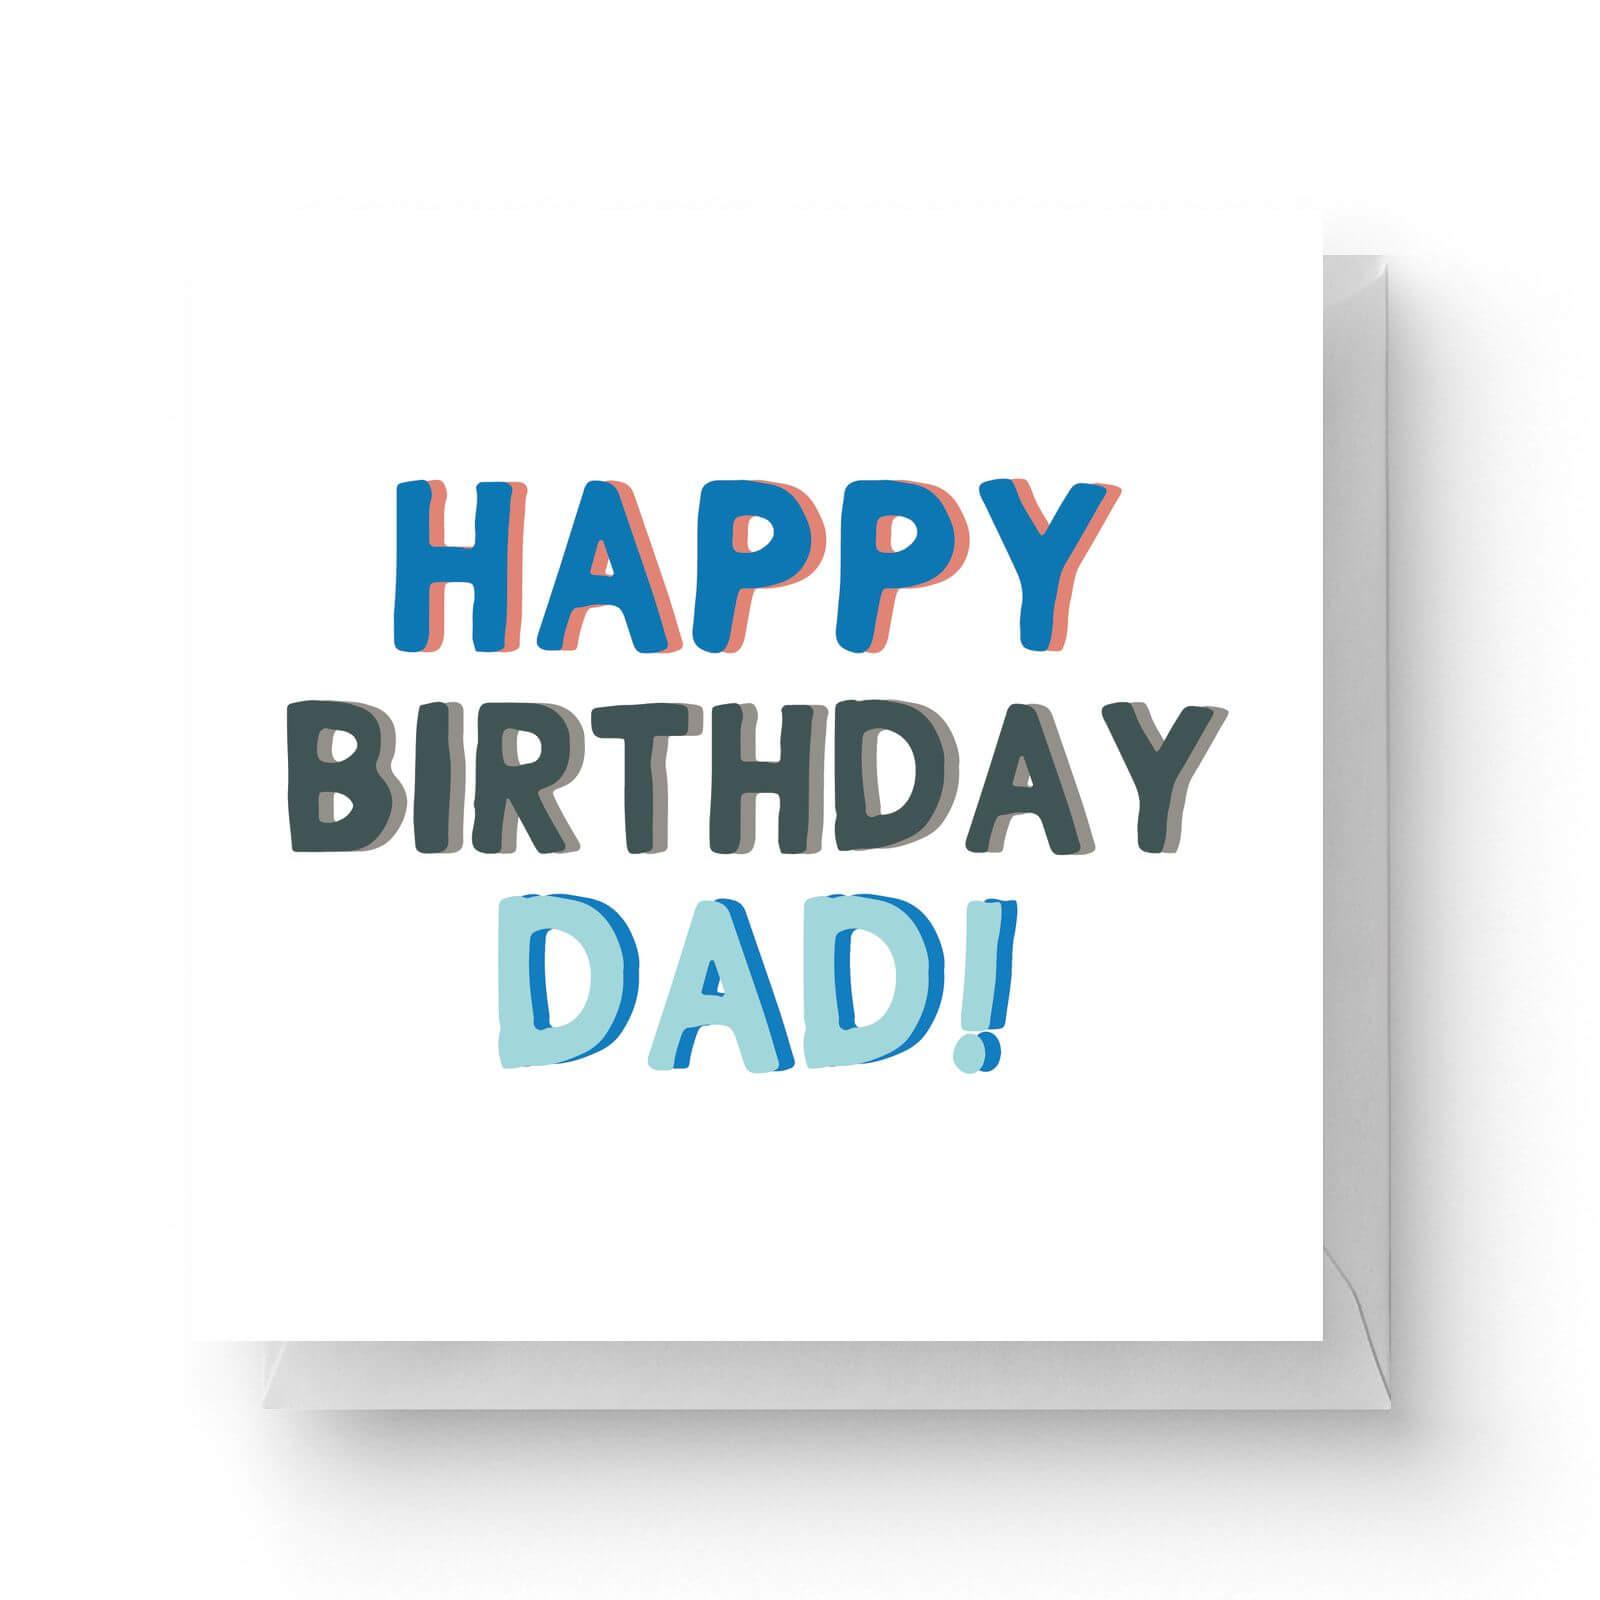 Image of Happy Birthday Dad Square Greetings Card (14.8cm x 14.8cm)